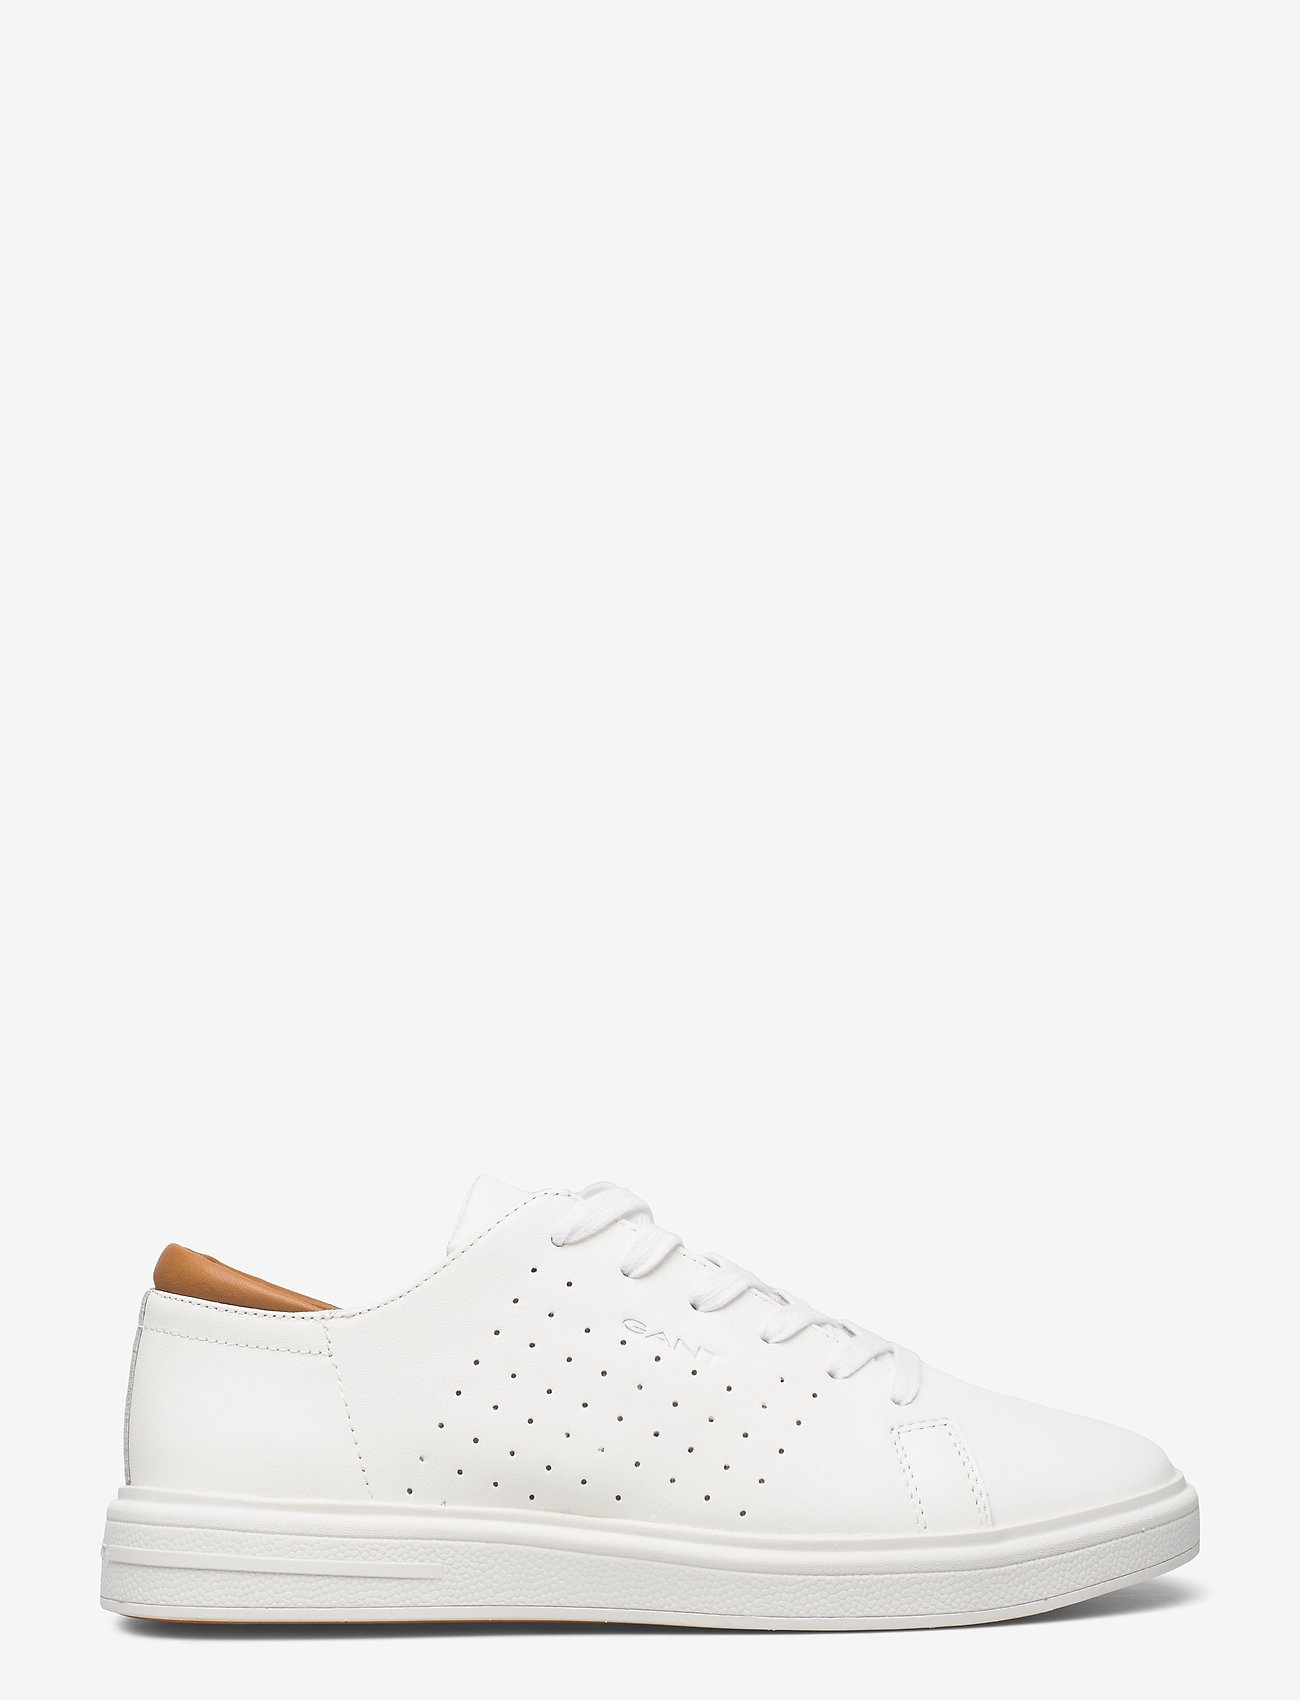 GANT - Fairville Low lace s - low tops - white - 1